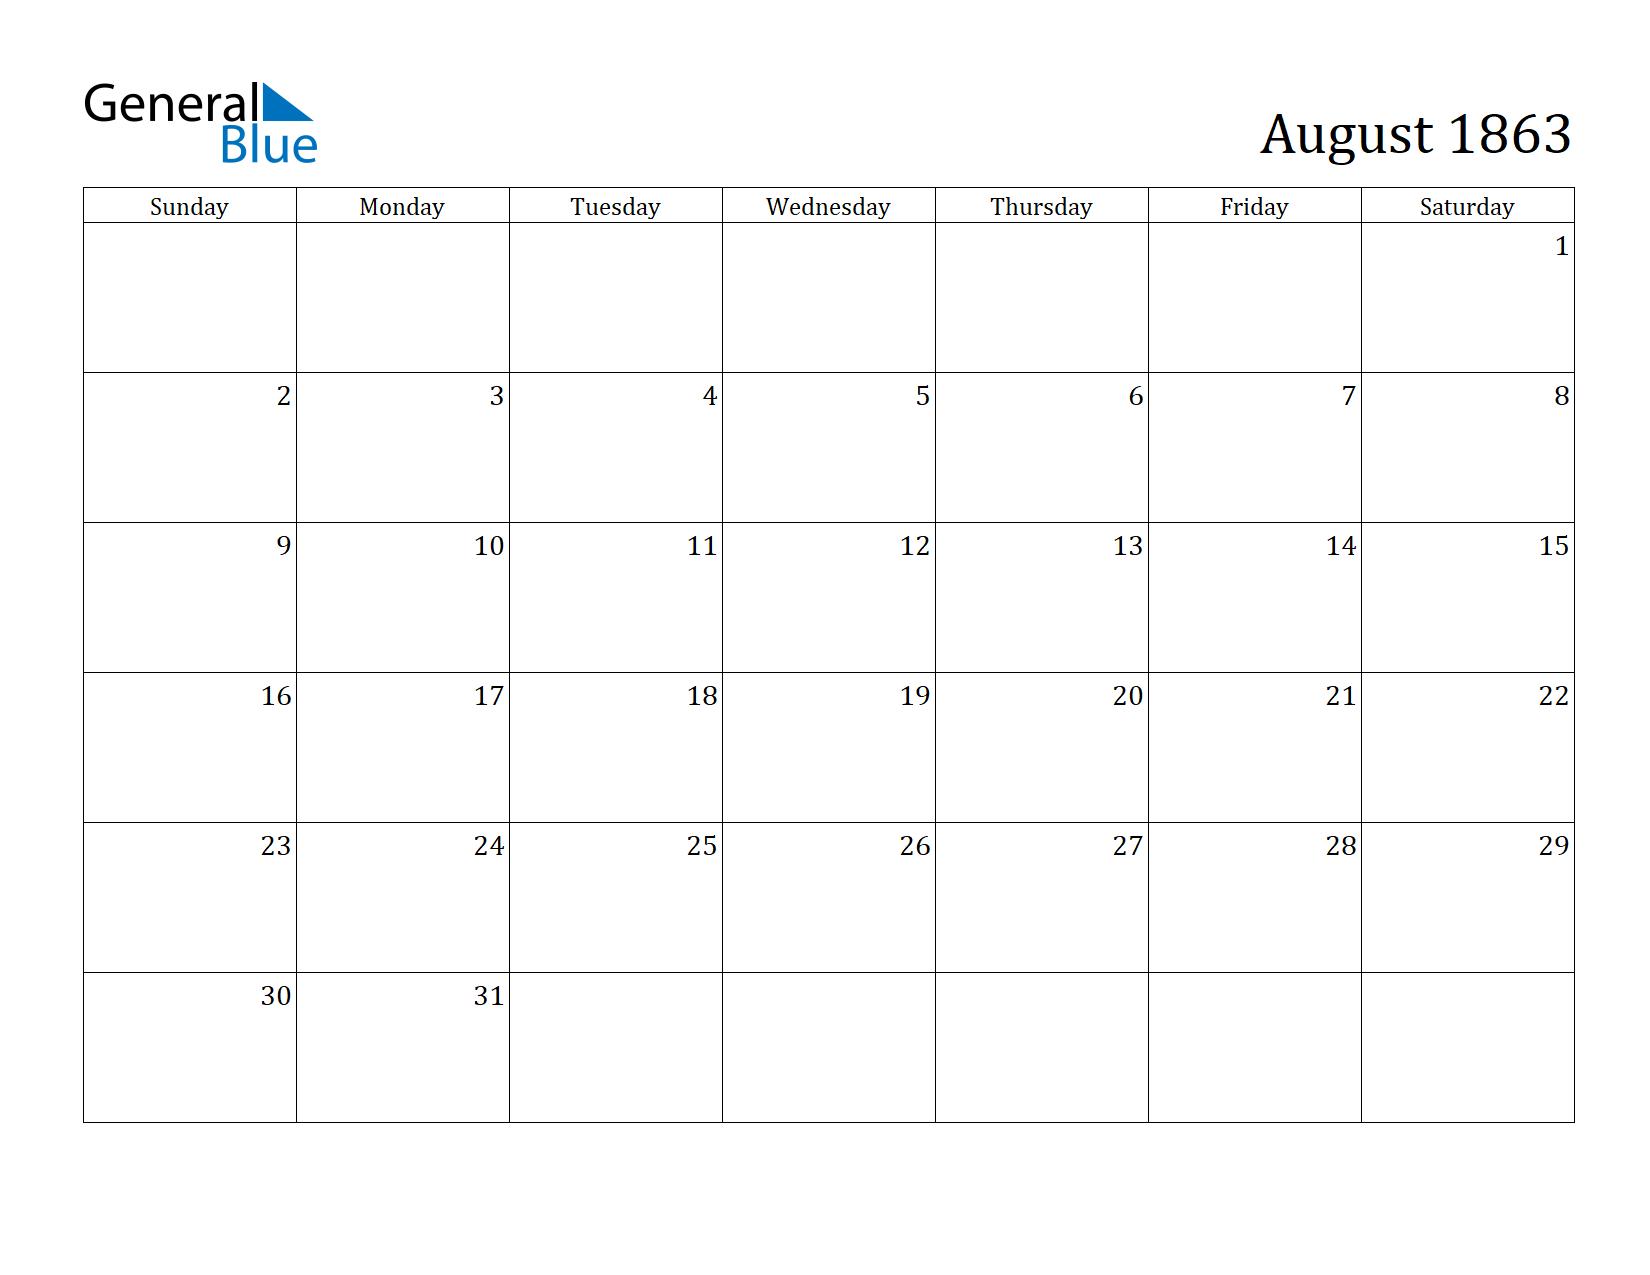 Image of August 1863 Calendar